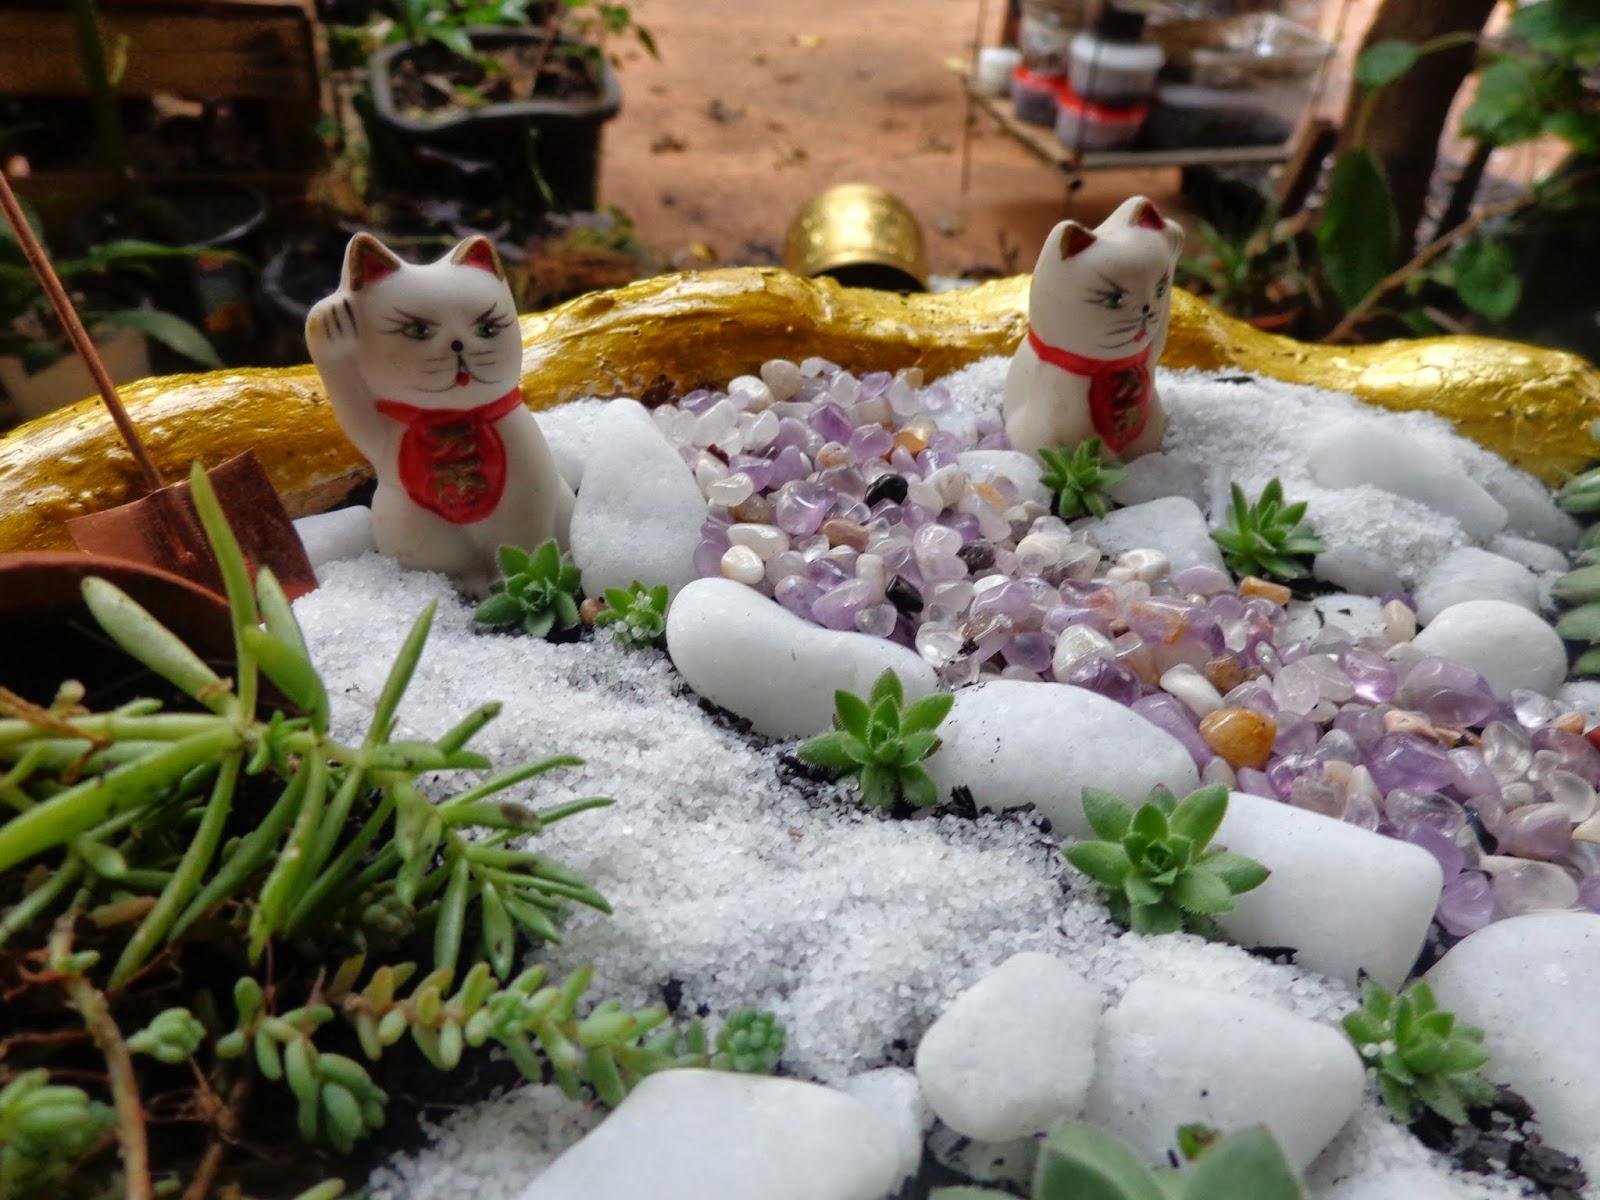 mini jardim cactos suculentas : mini jardim cactos suculentas:Mini-jardim de cactos e suculentas – Diário de uma Sementeira